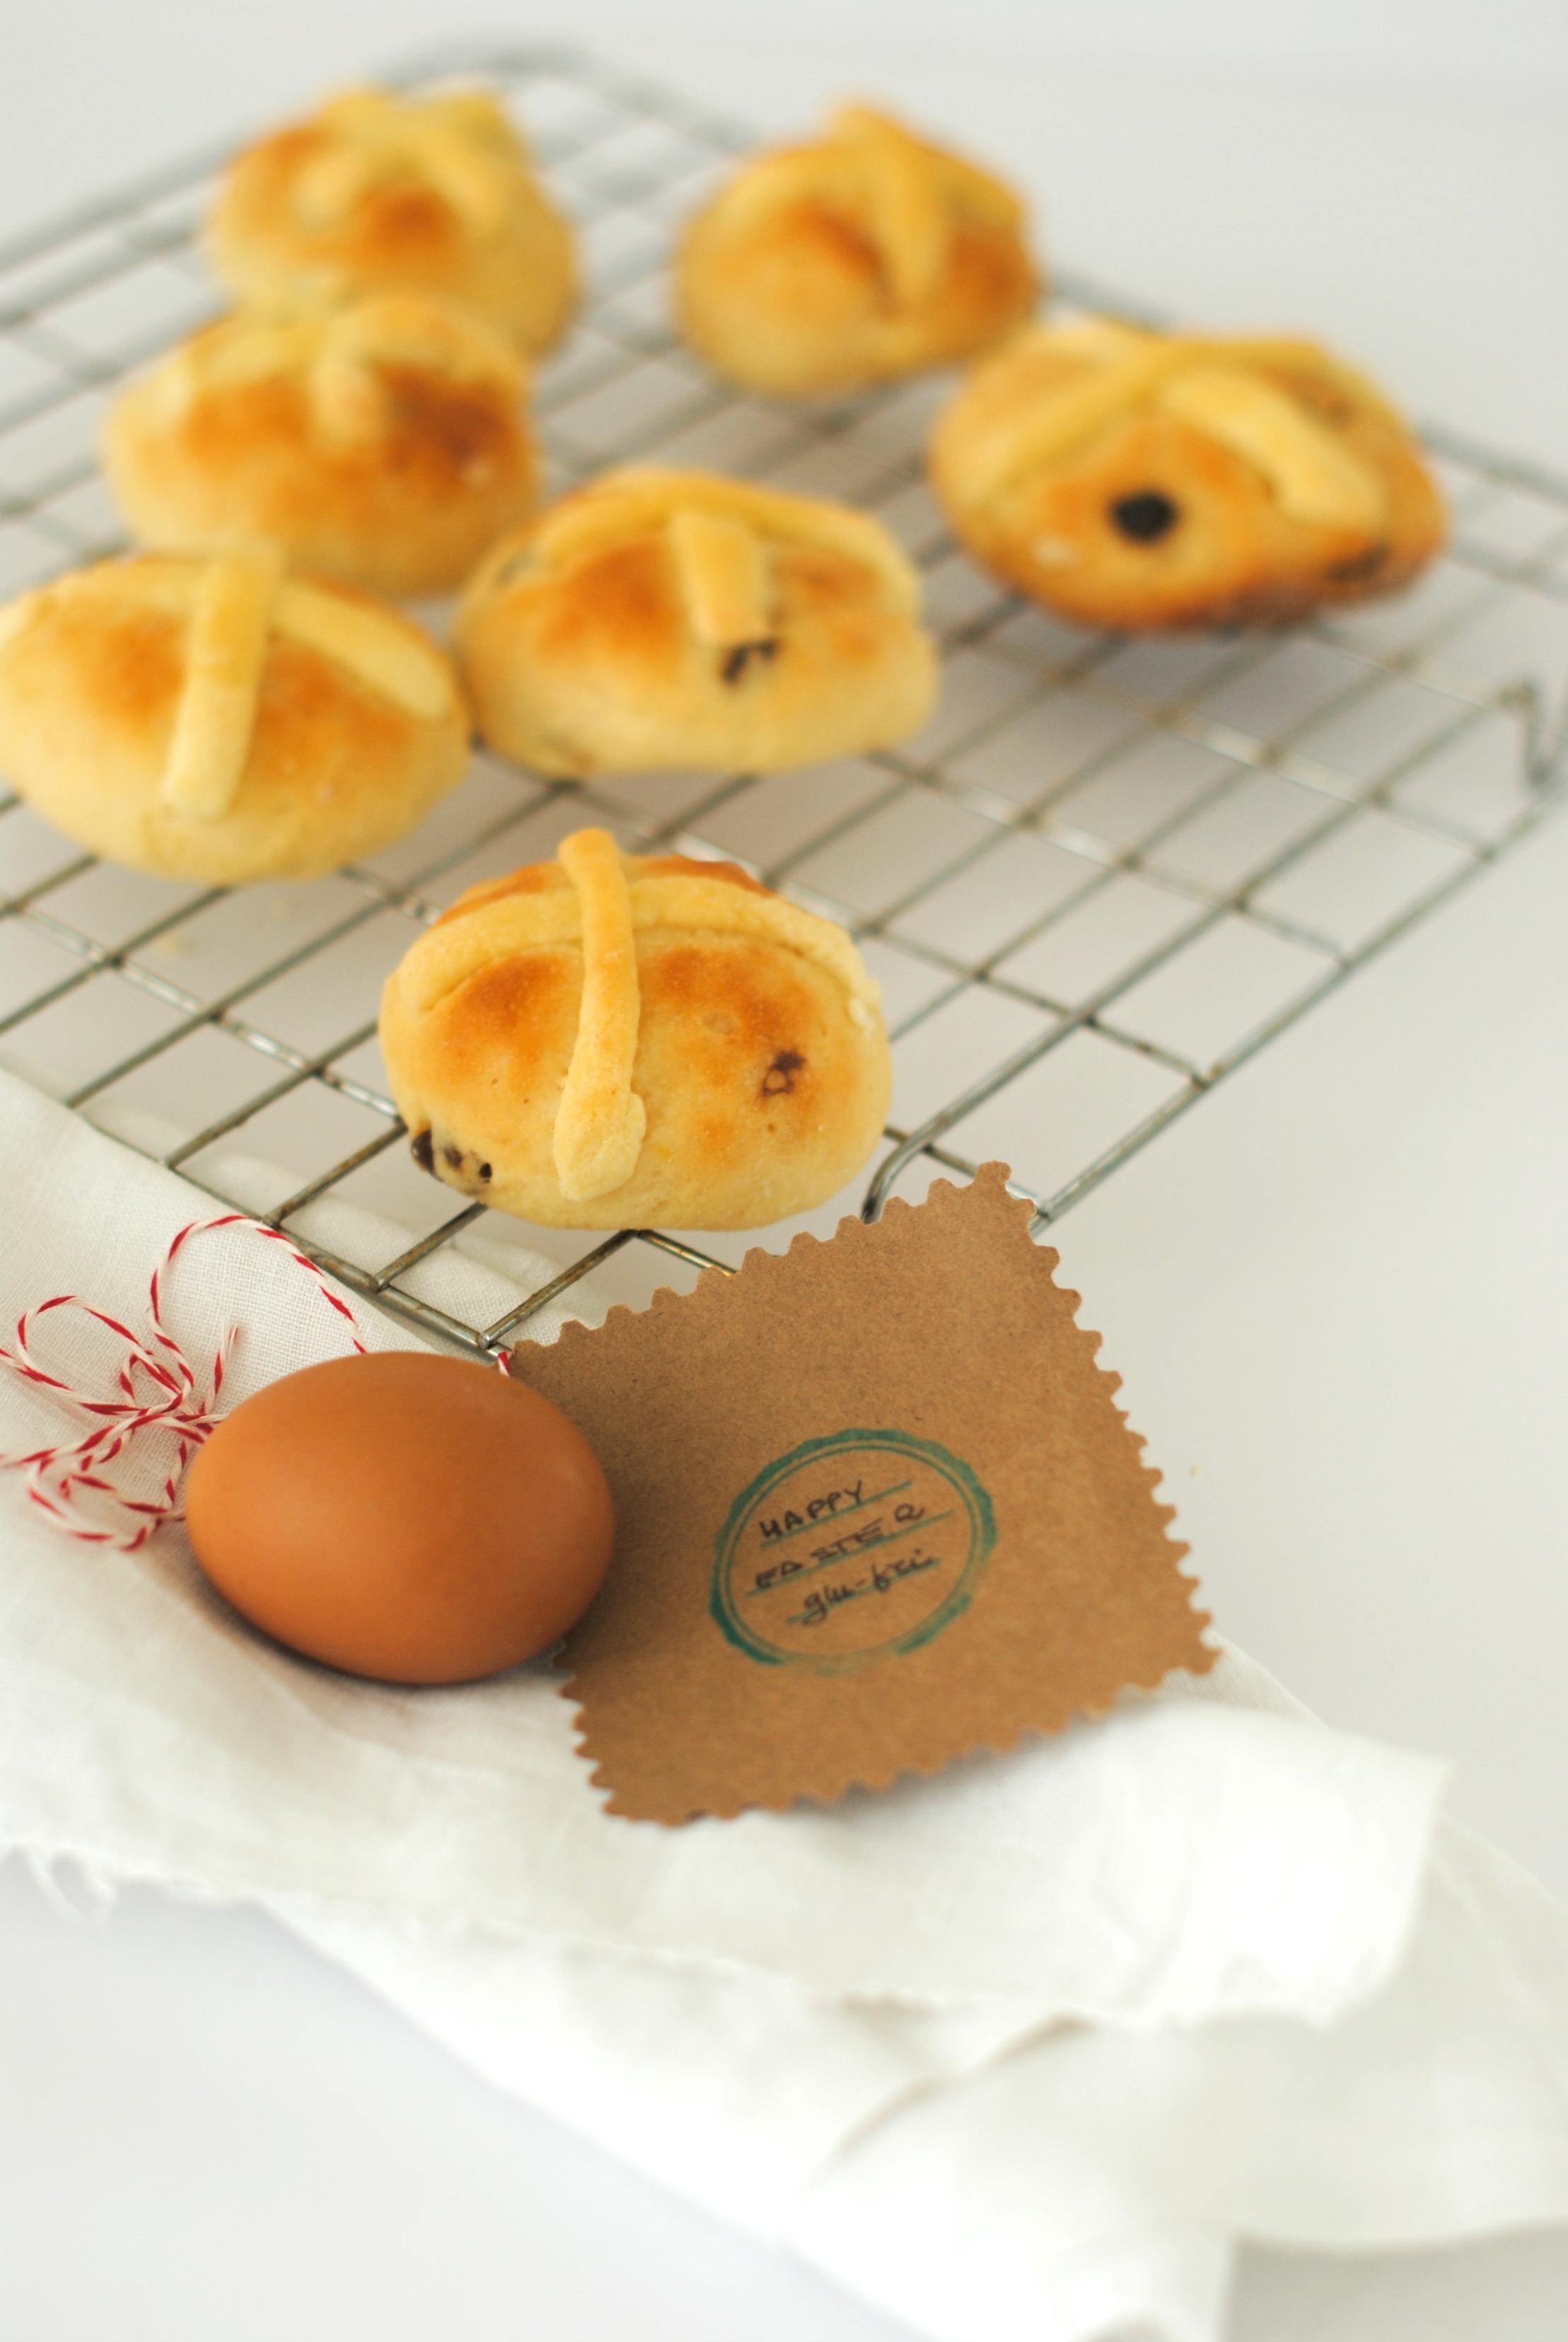 Hot cross buns senza glutine